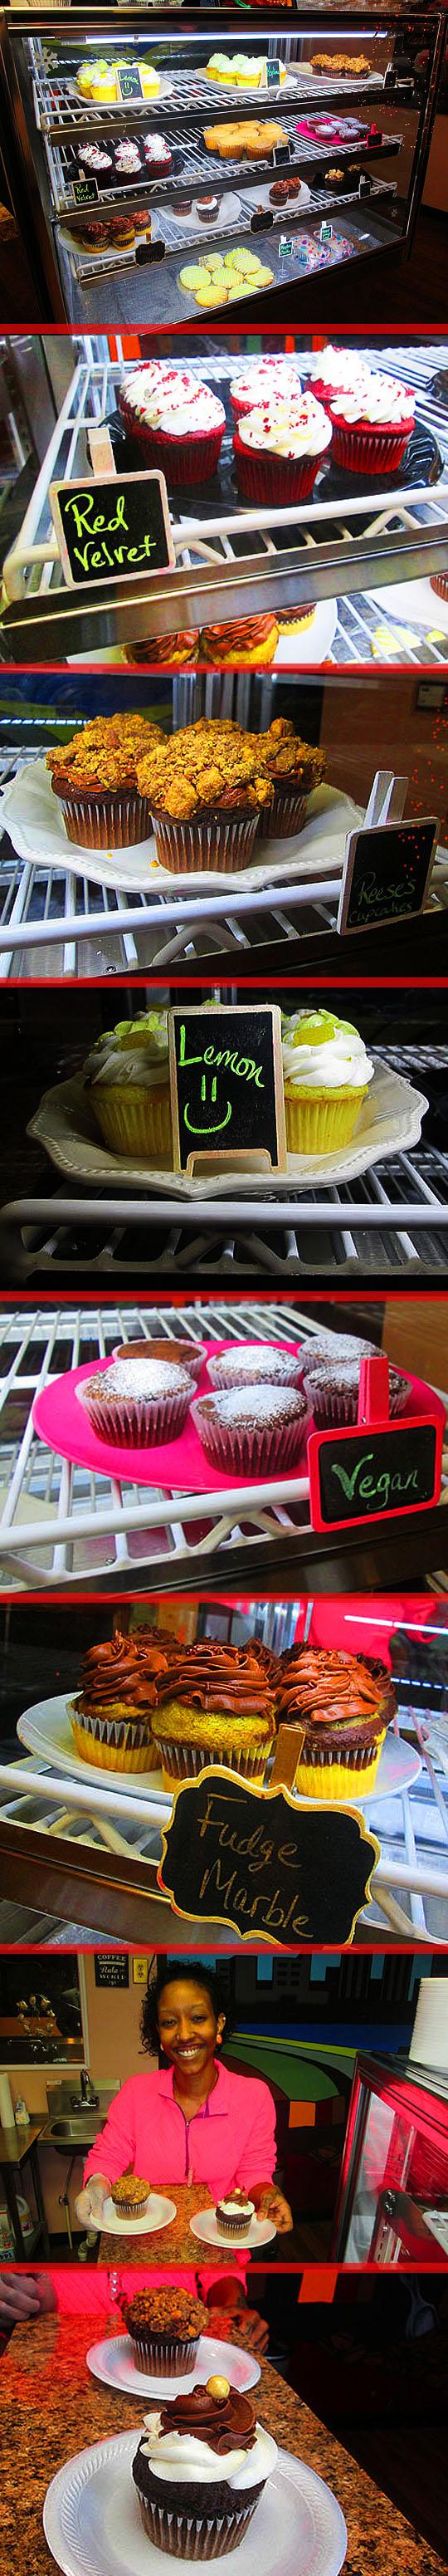 10. cupcakes_12-5-17.jpg